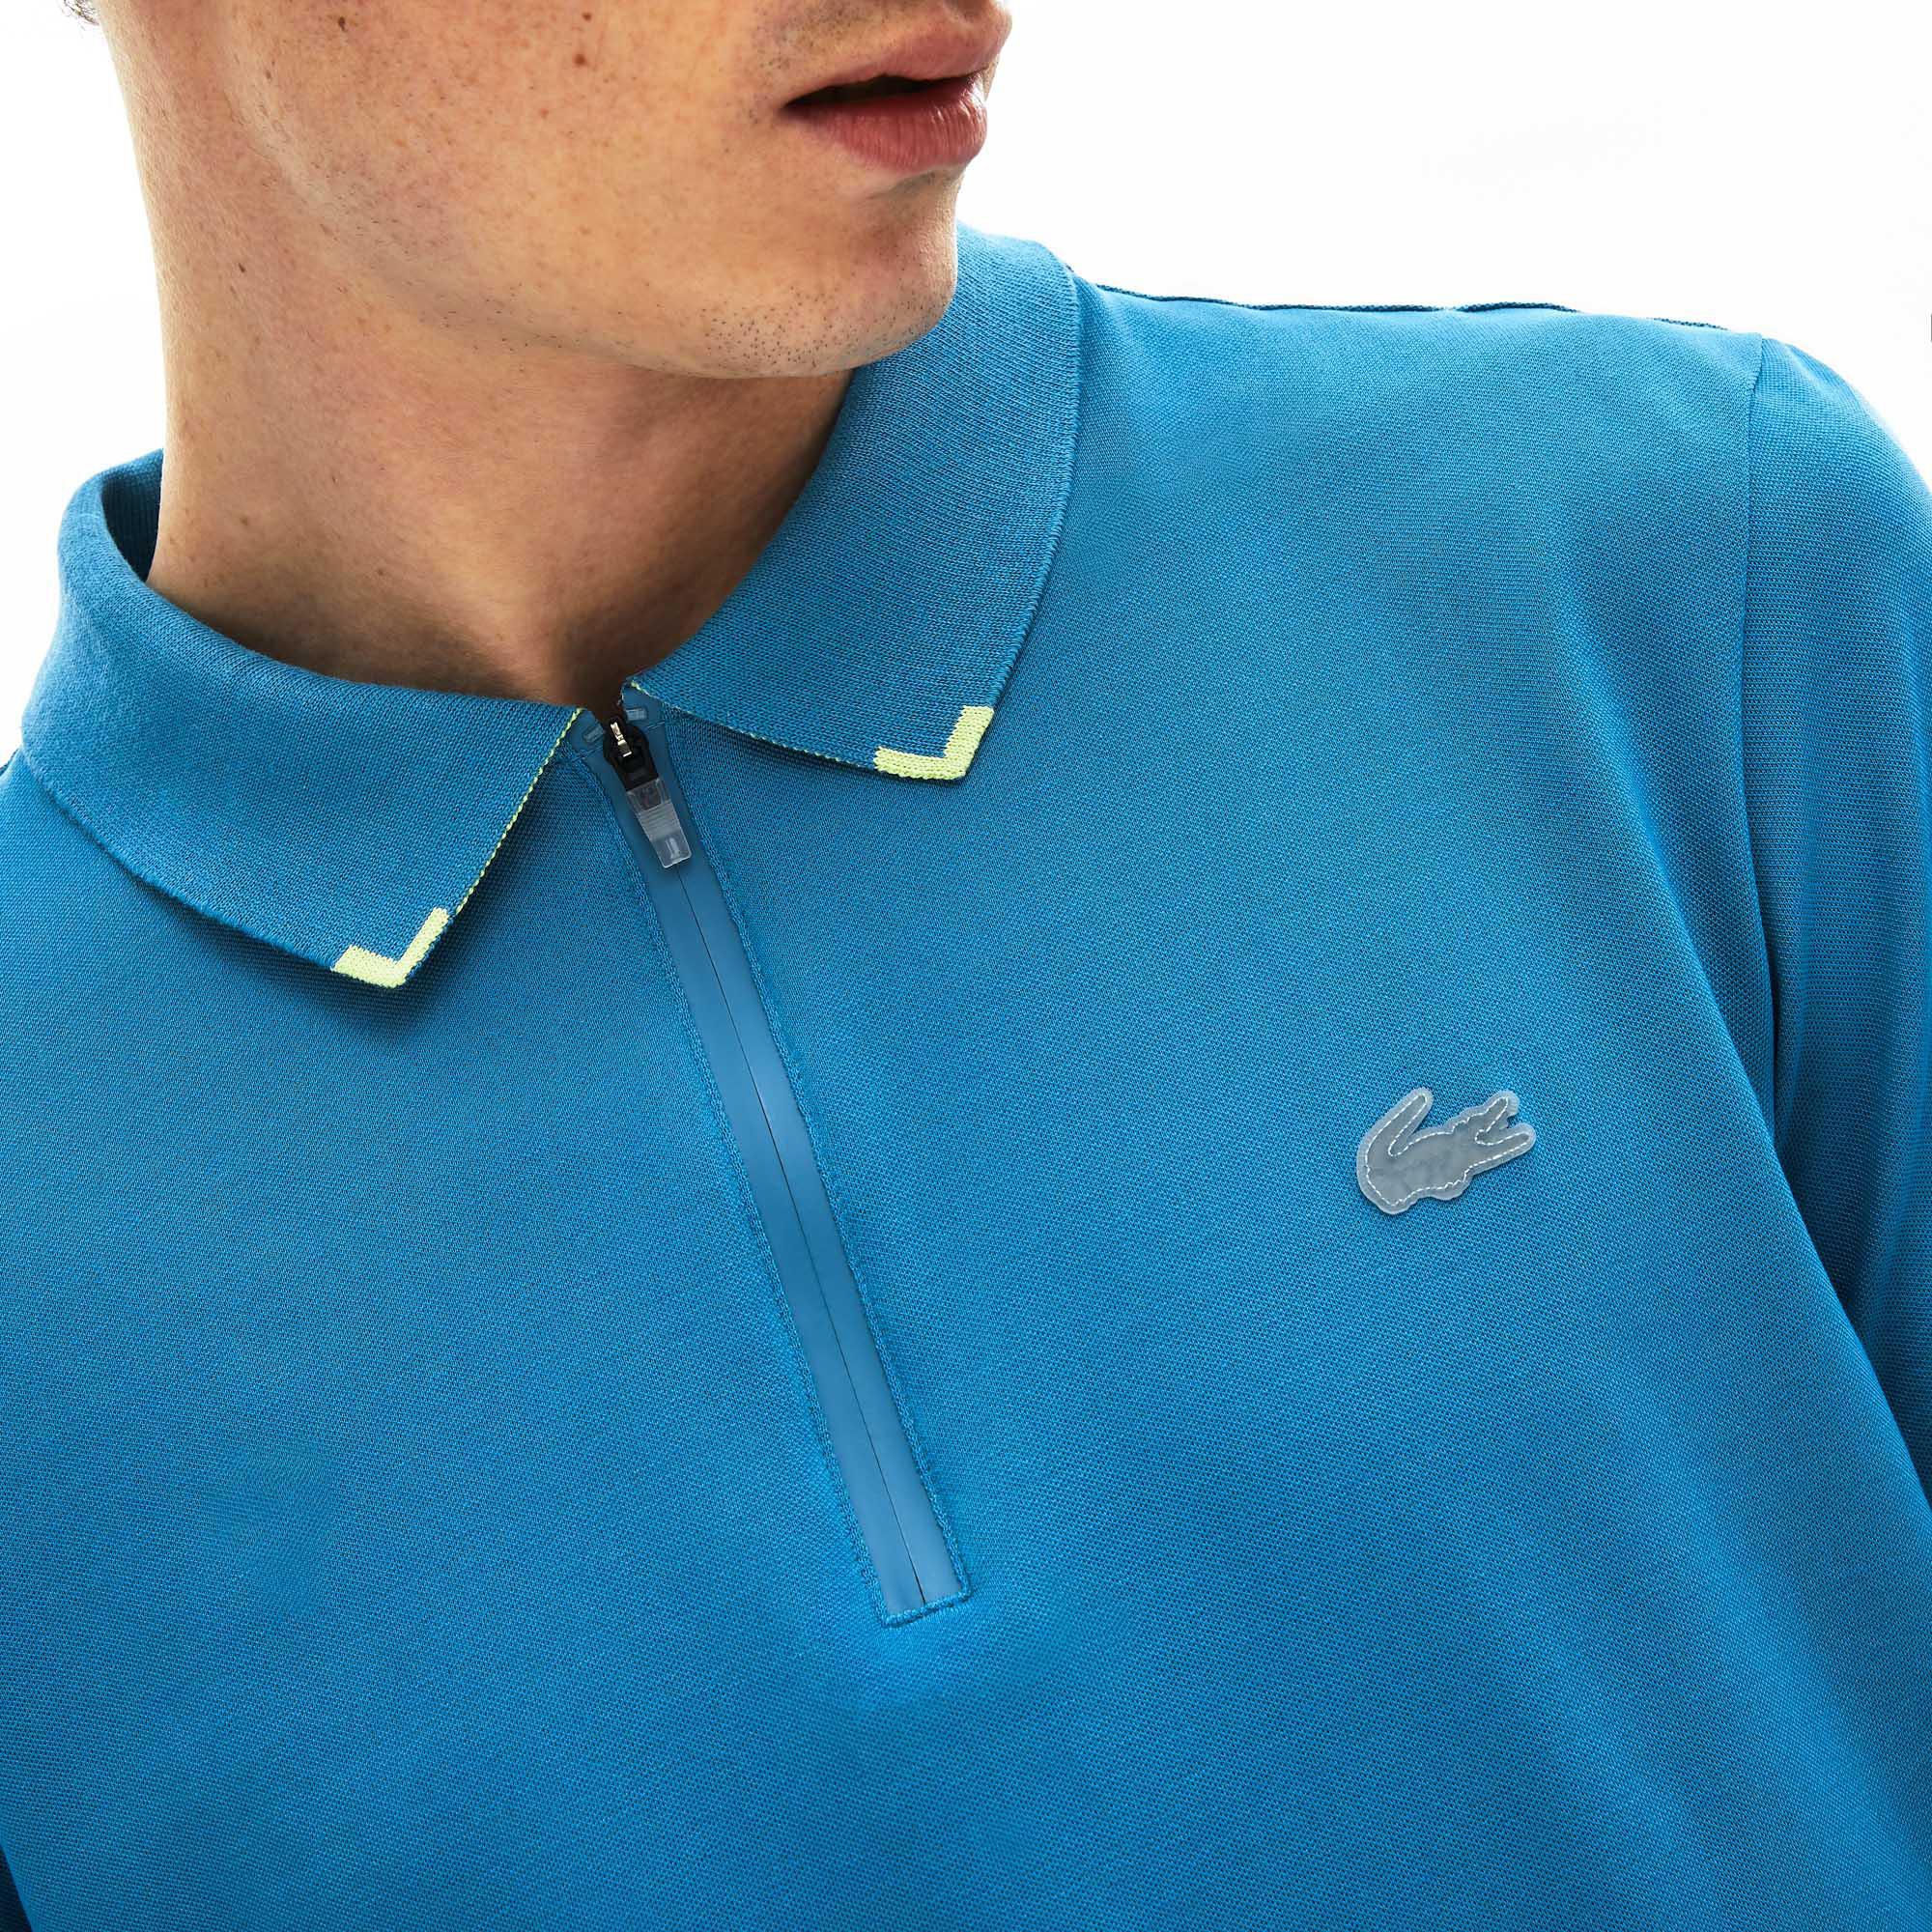 Lacoste Men's Motion Ultra-Light Cotton Polo